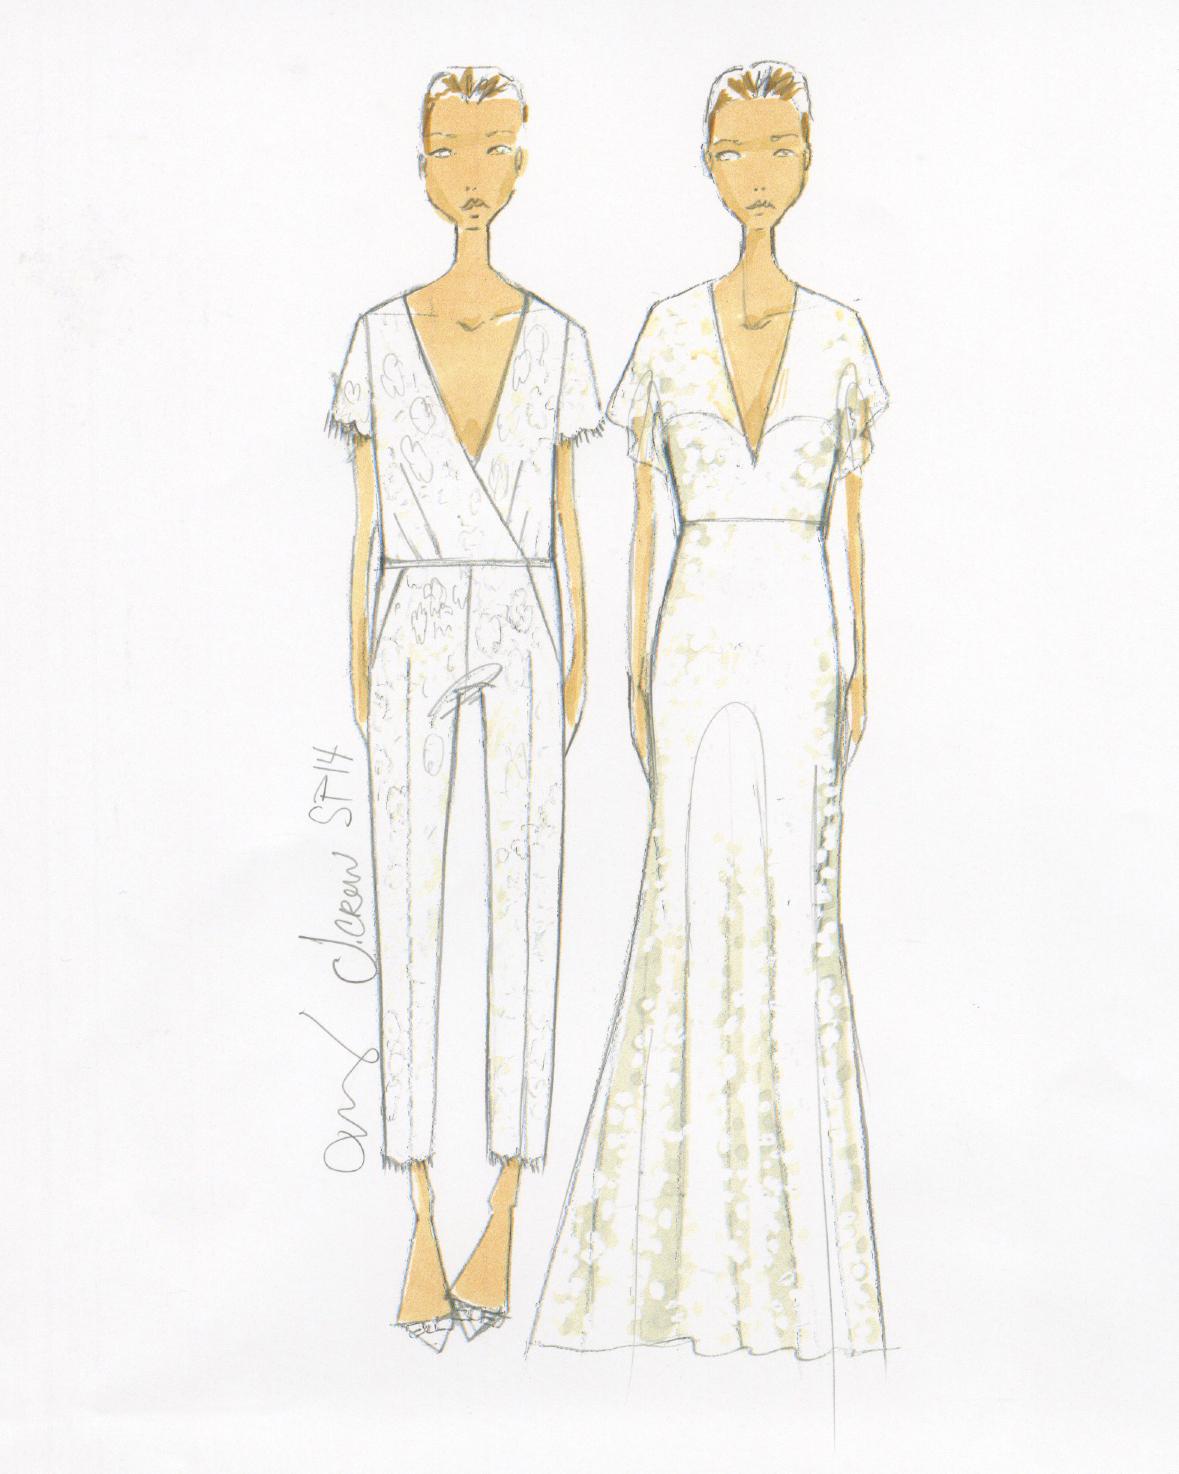 msw-bridal-sketches-inspiration-j-crew-1.jpg